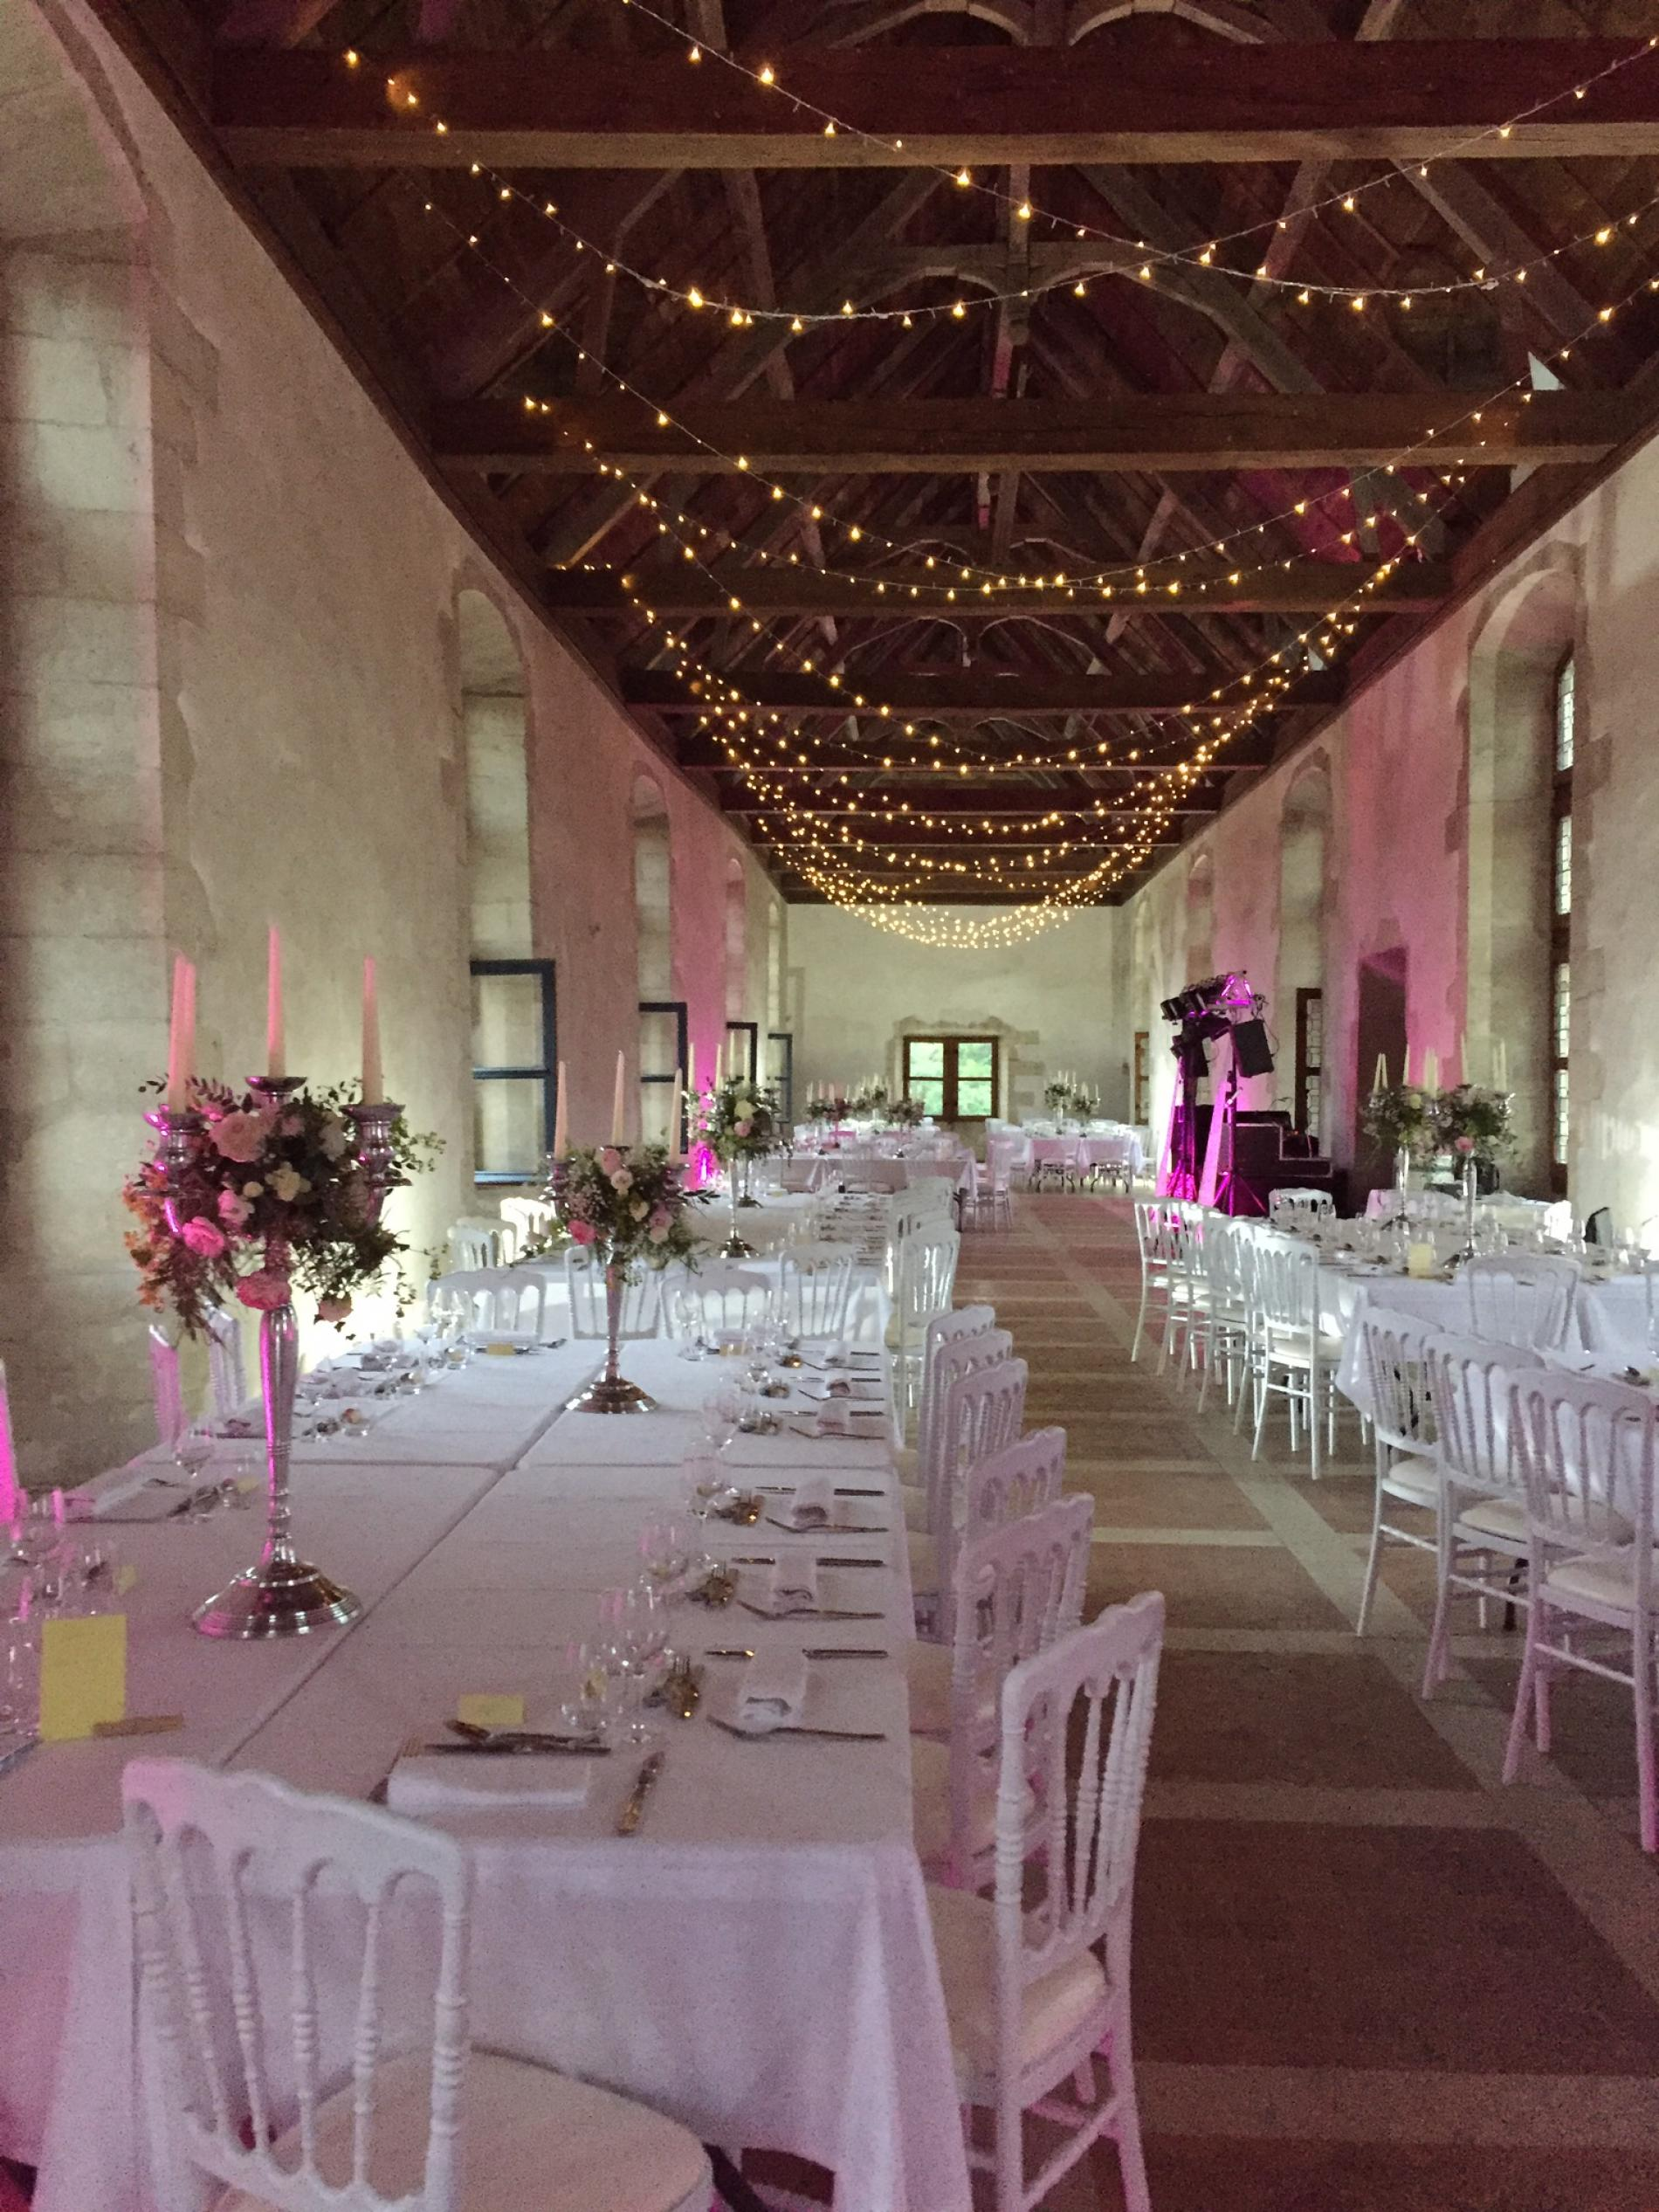 belle salle de Mariage